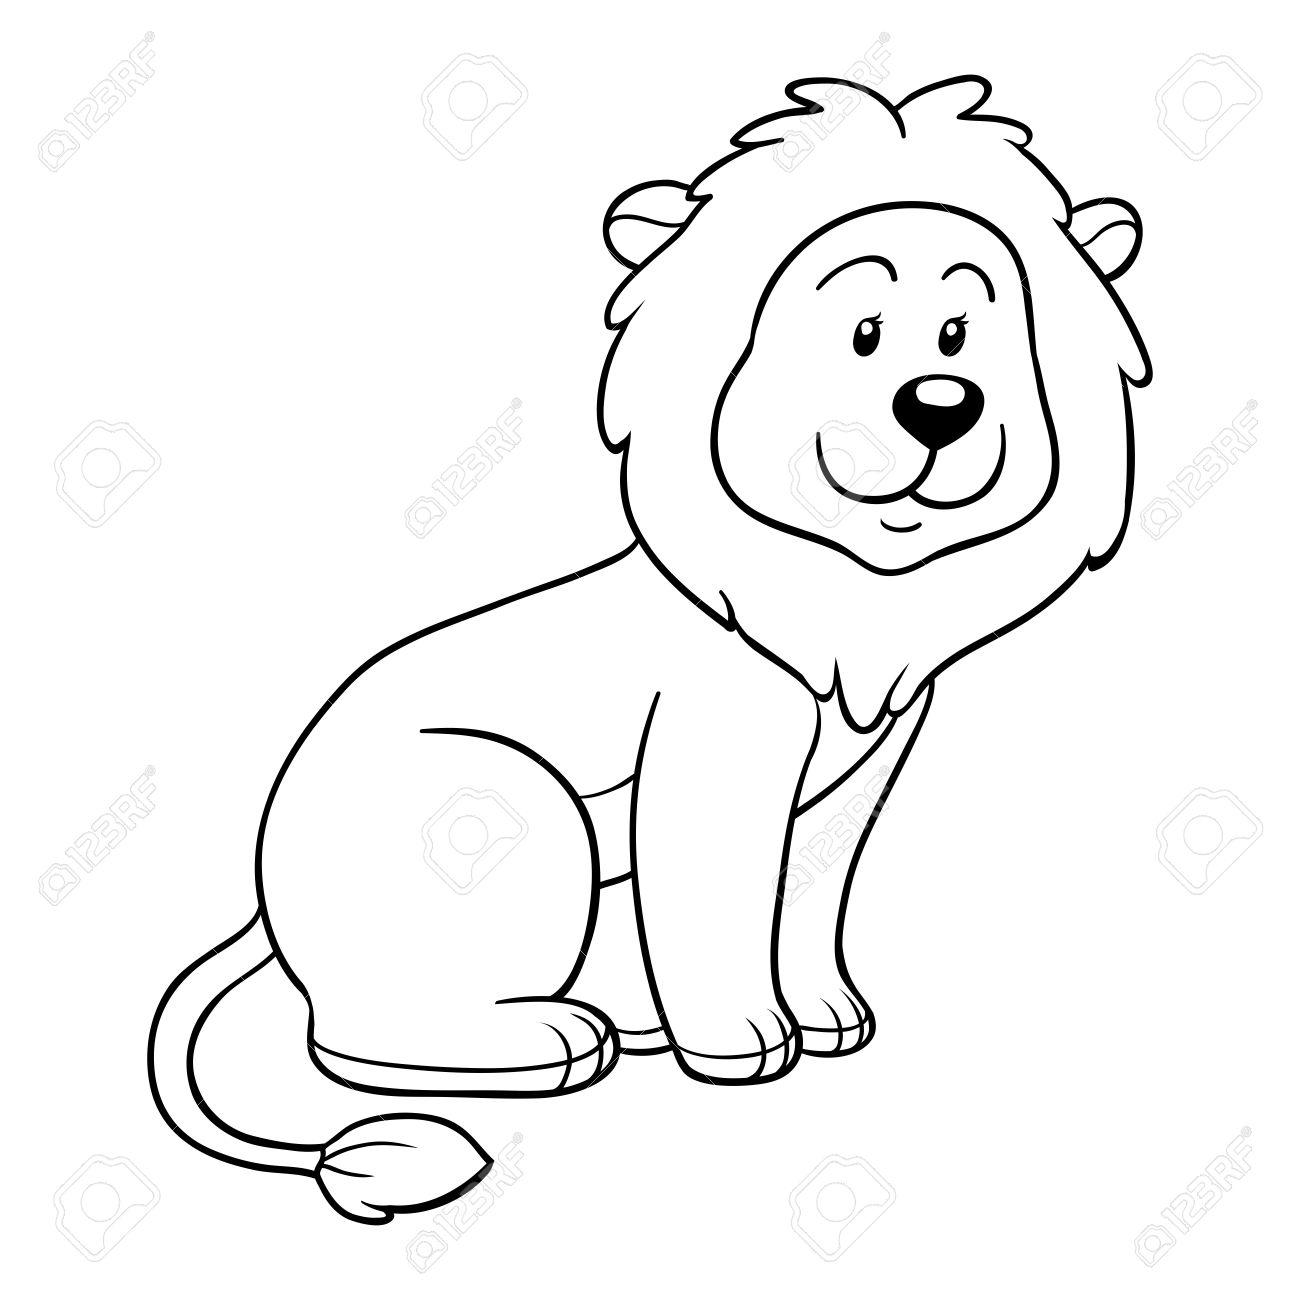 Lion colorings - Coloring Book Lion Coloring Book Lion Coloring Book Lion Stock Vector 33960669